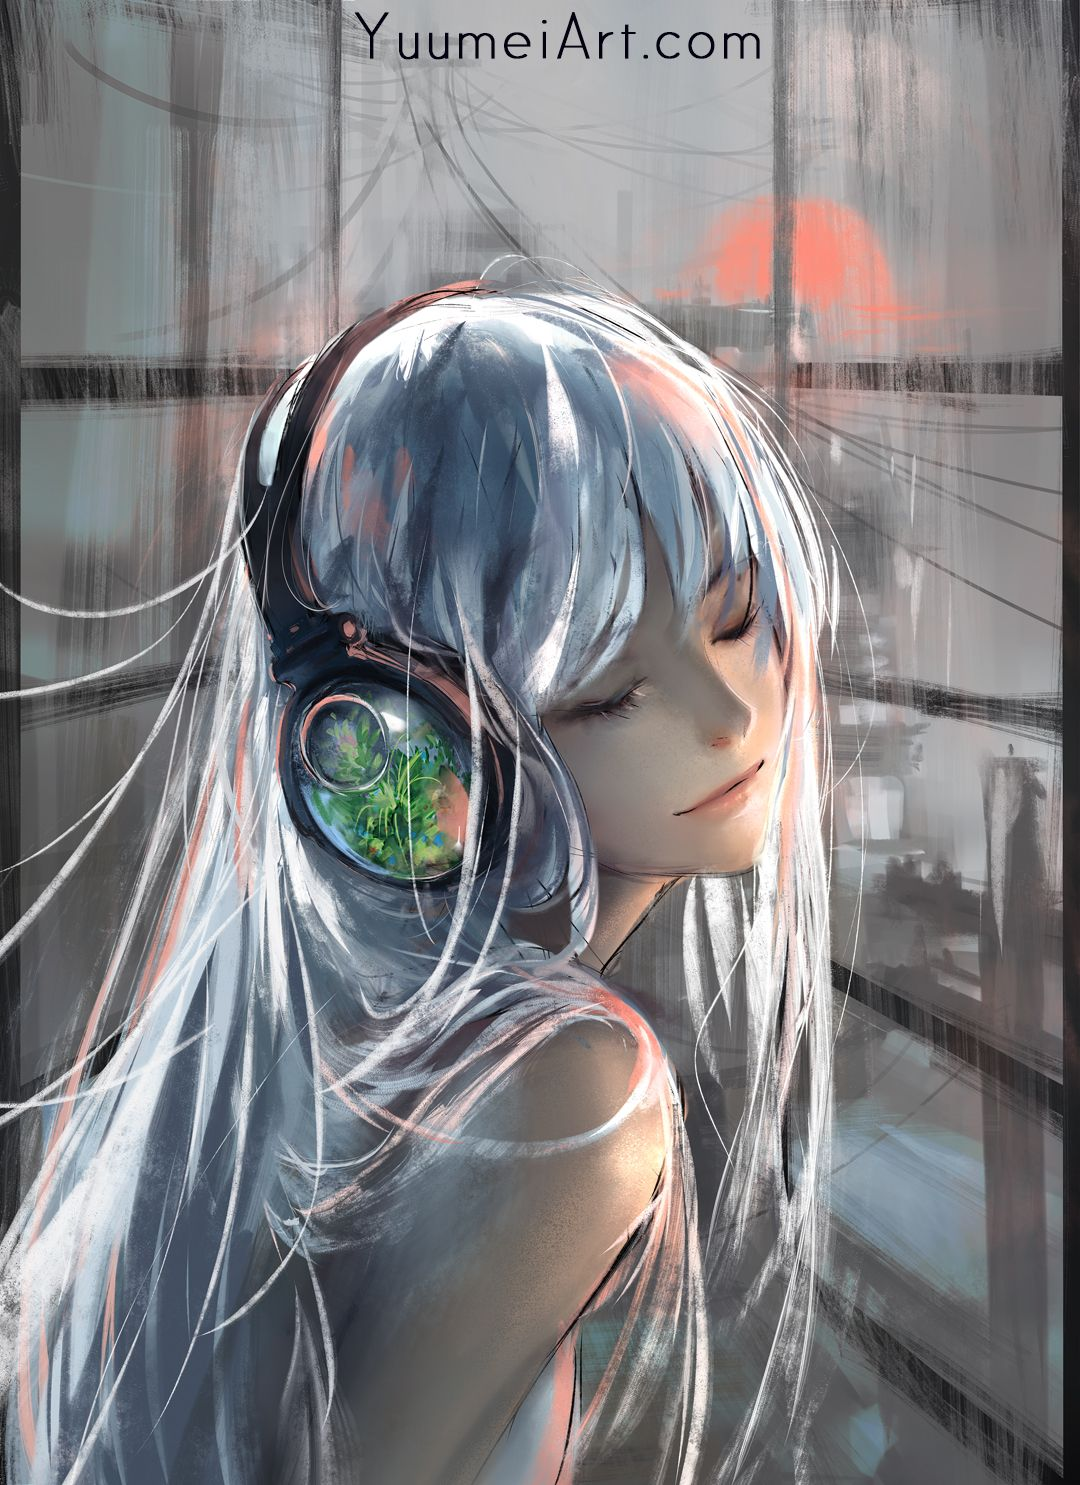 Closed Eyes White Hair Original Characters Anime Anime Girls Headphones Wallpaper No 766992 Wallha Anime Art Beautiful Anime Art Girl Anime Art